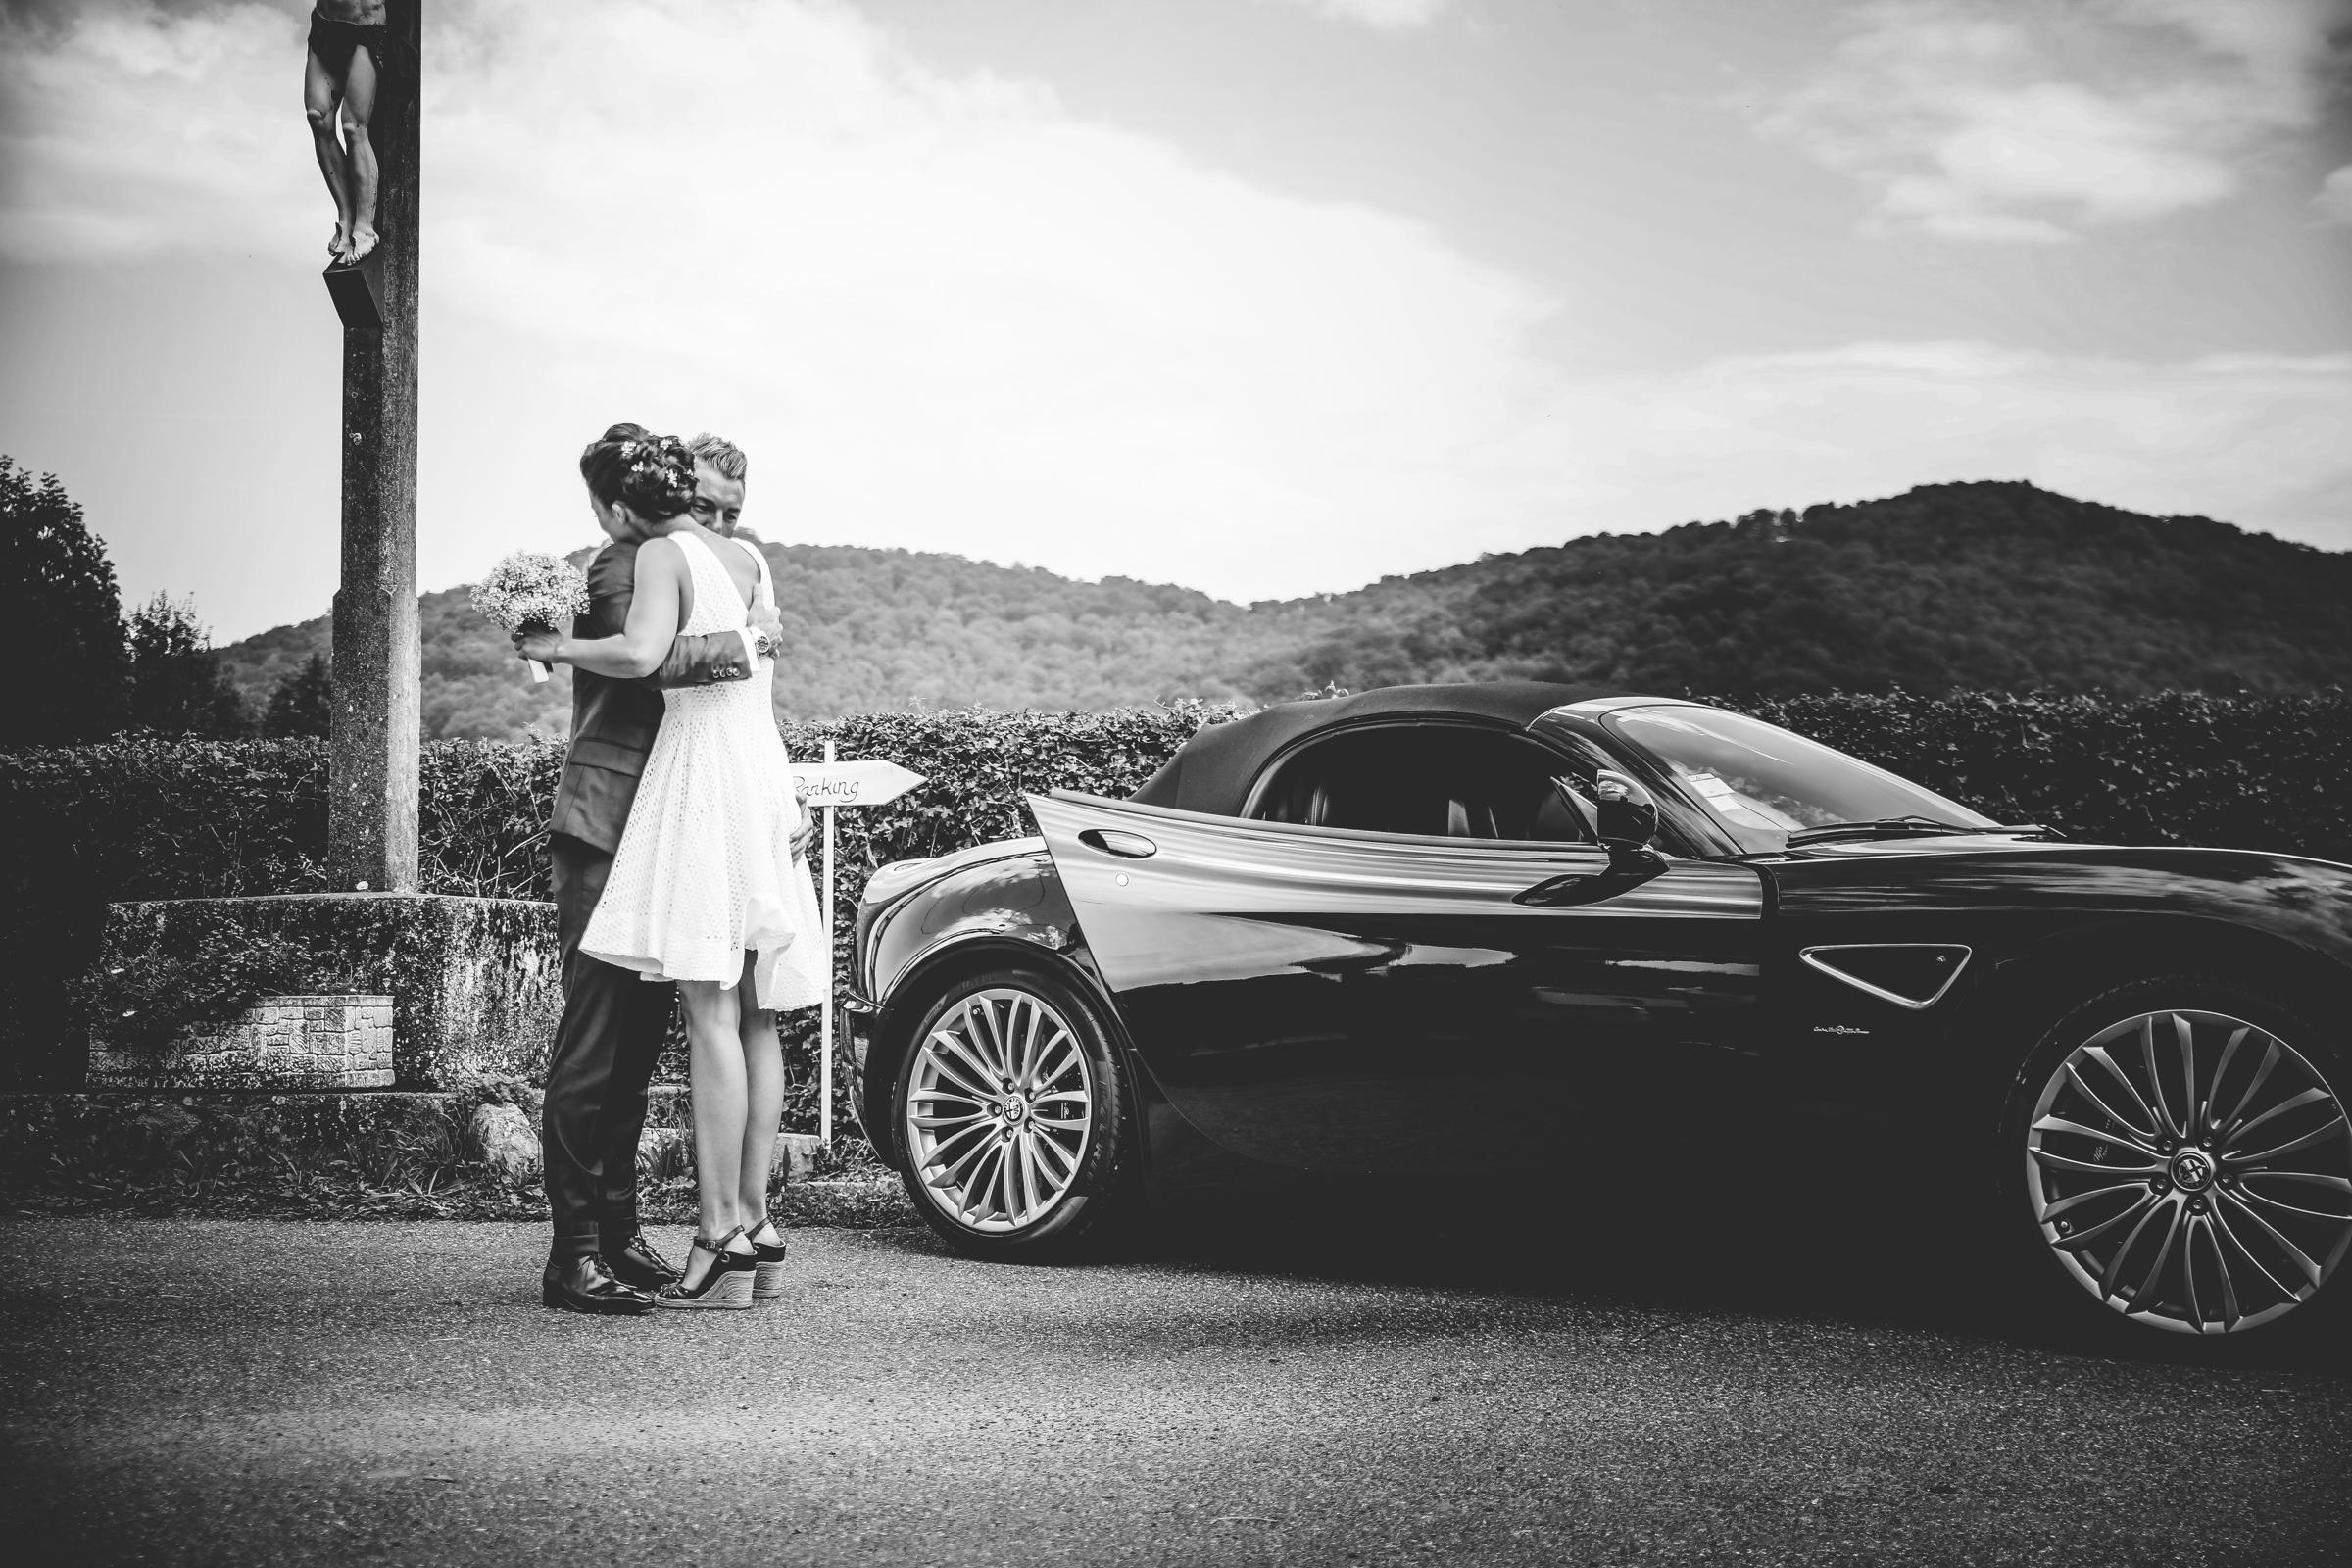 Couple by car - photo by Julien Laurent-Georges